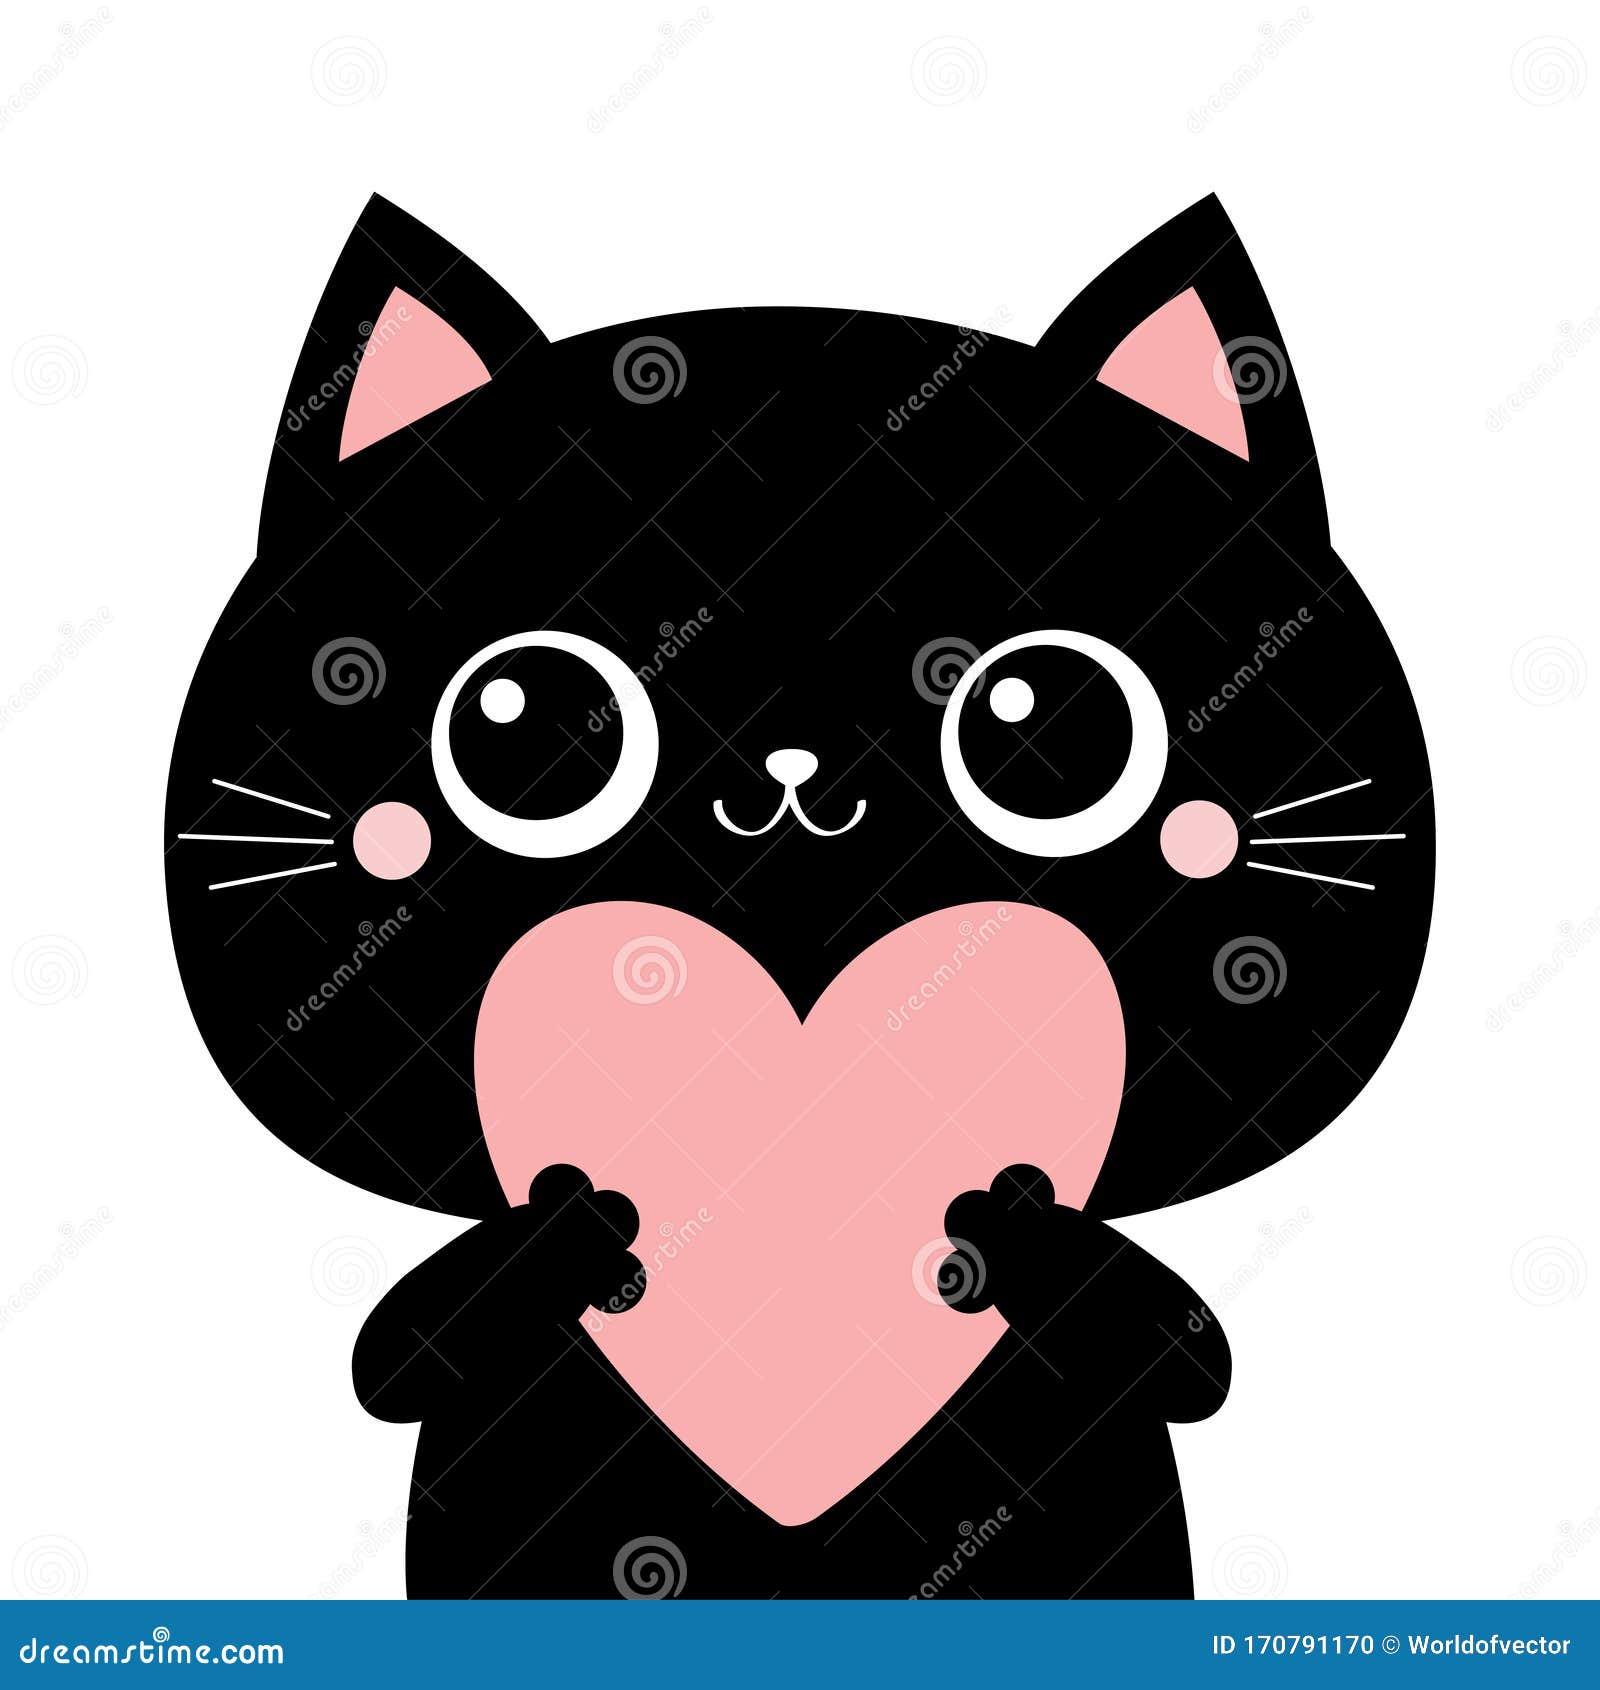 Black Cat Kitten Kitty Head Face Holding Big Pink Heart Happy